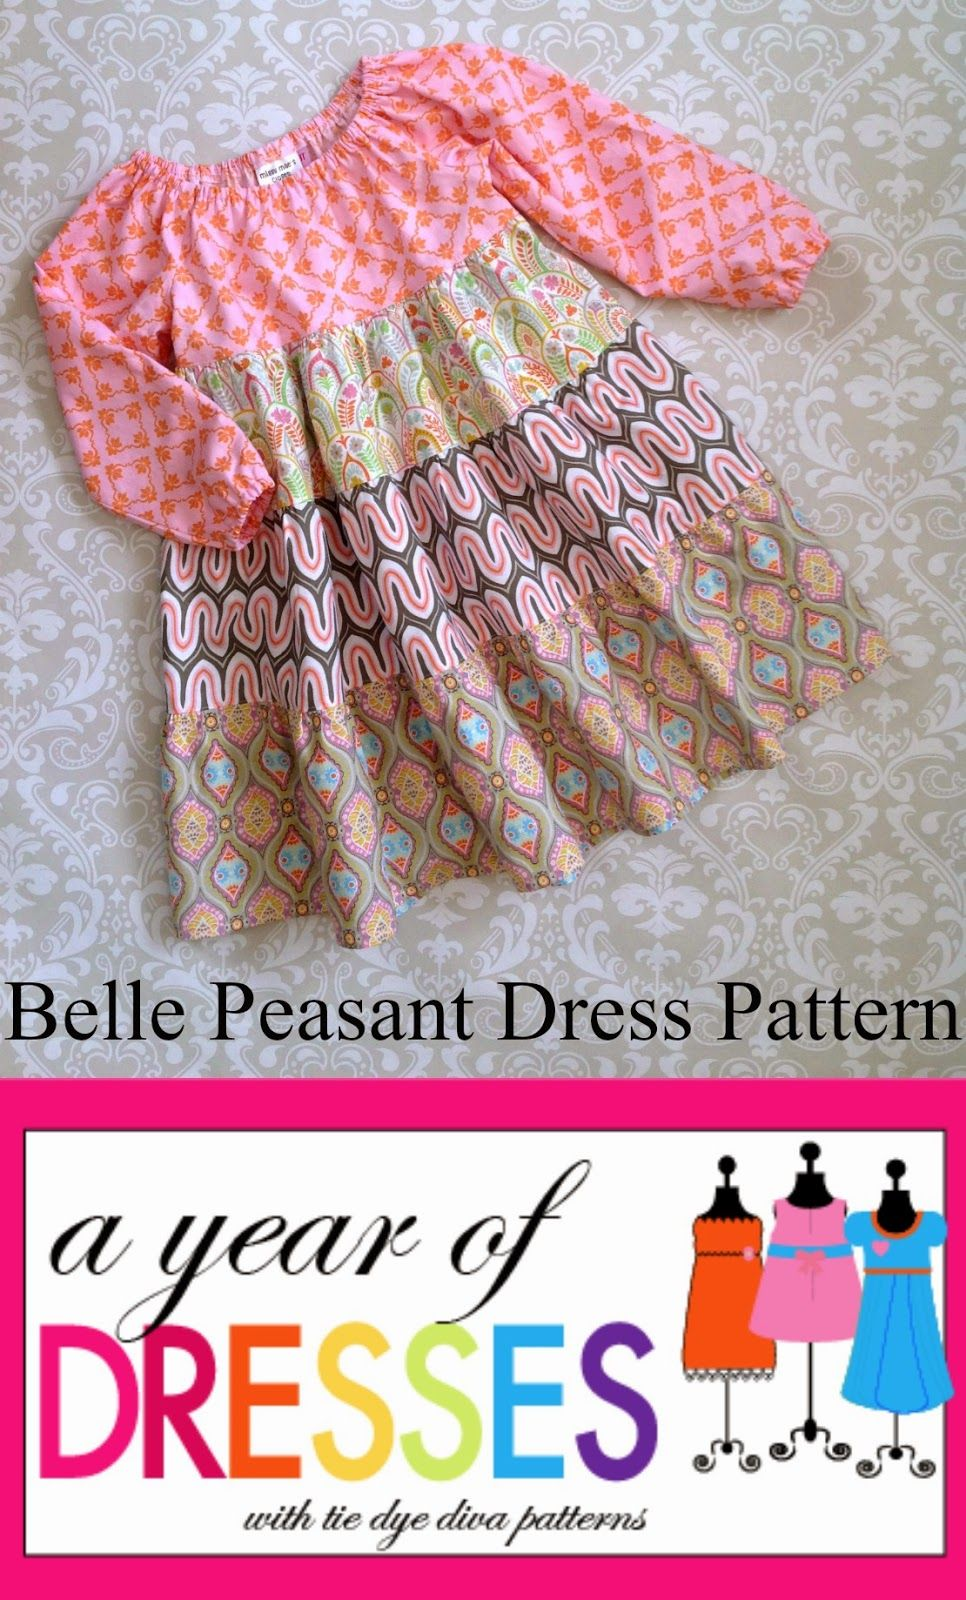 FREE Doll Dress Pattern - Riley Blake Flit & Bloom Blog Tour - Tie Dye Diva Patterns Blog #dolldresspatterns